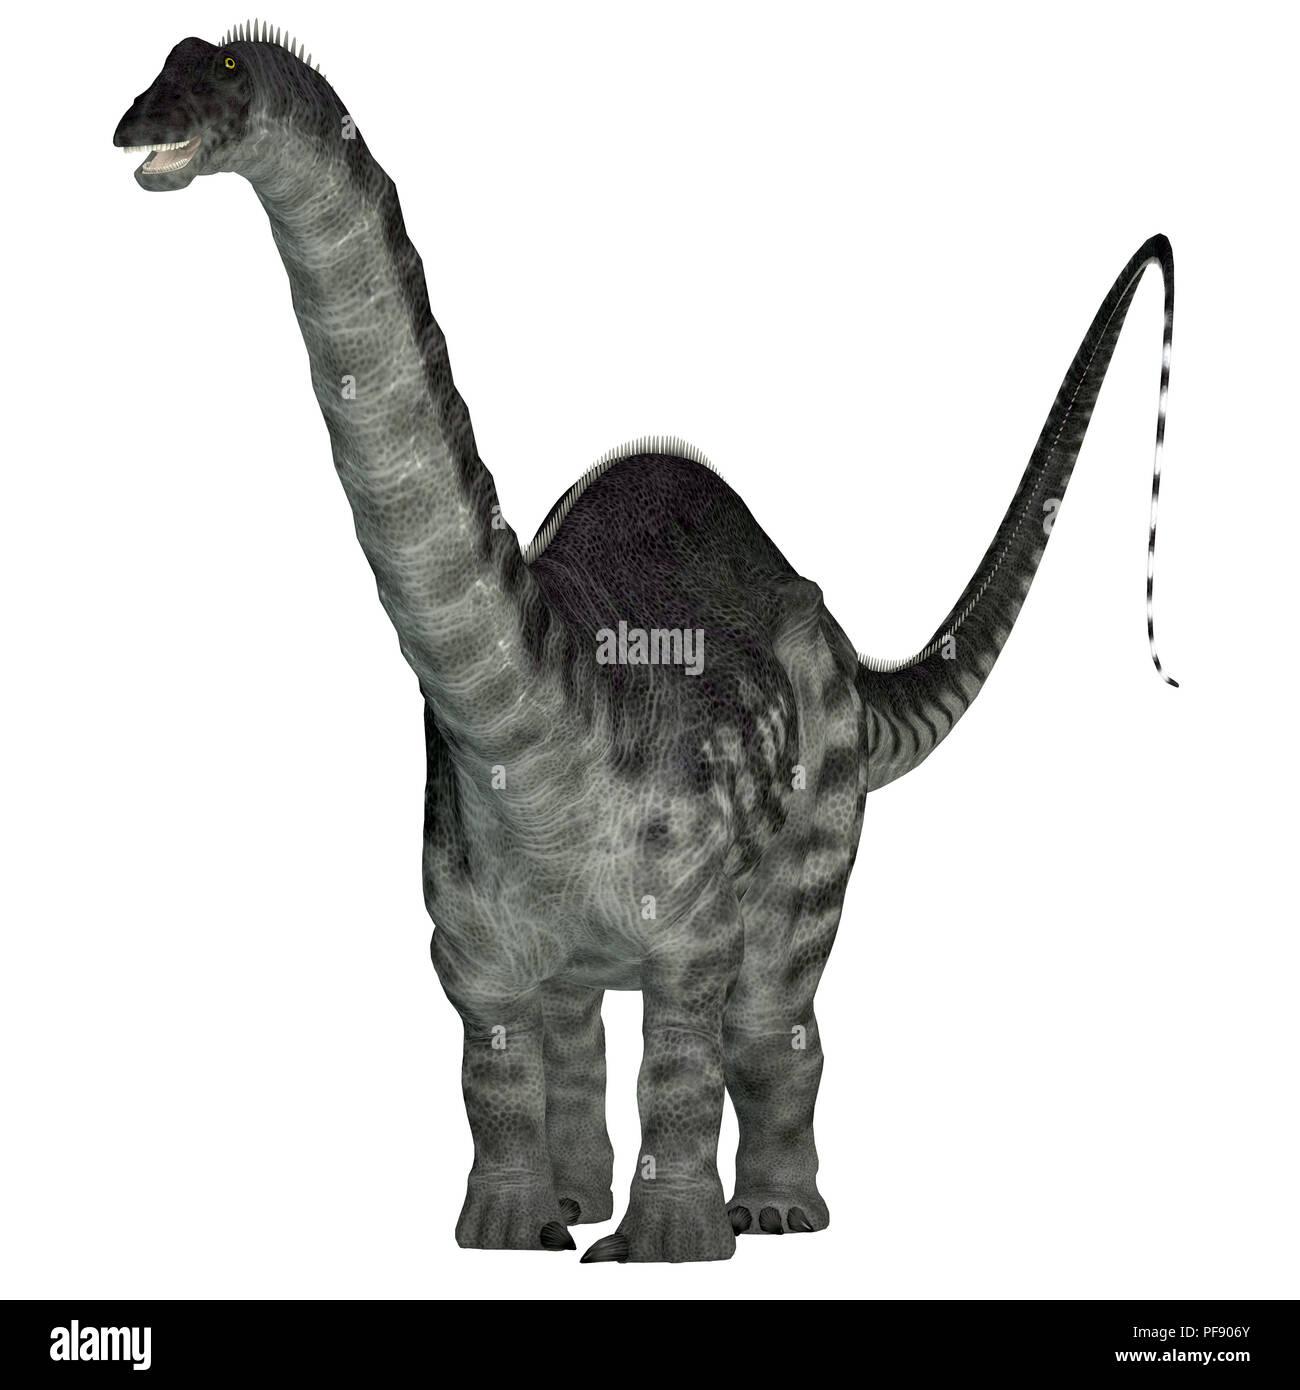 Apatosaurus Dinosaur - Apatosaurus was a herbivorous sauropod dinosaur that lived in North America during the Jurassic Period. Stock Photo